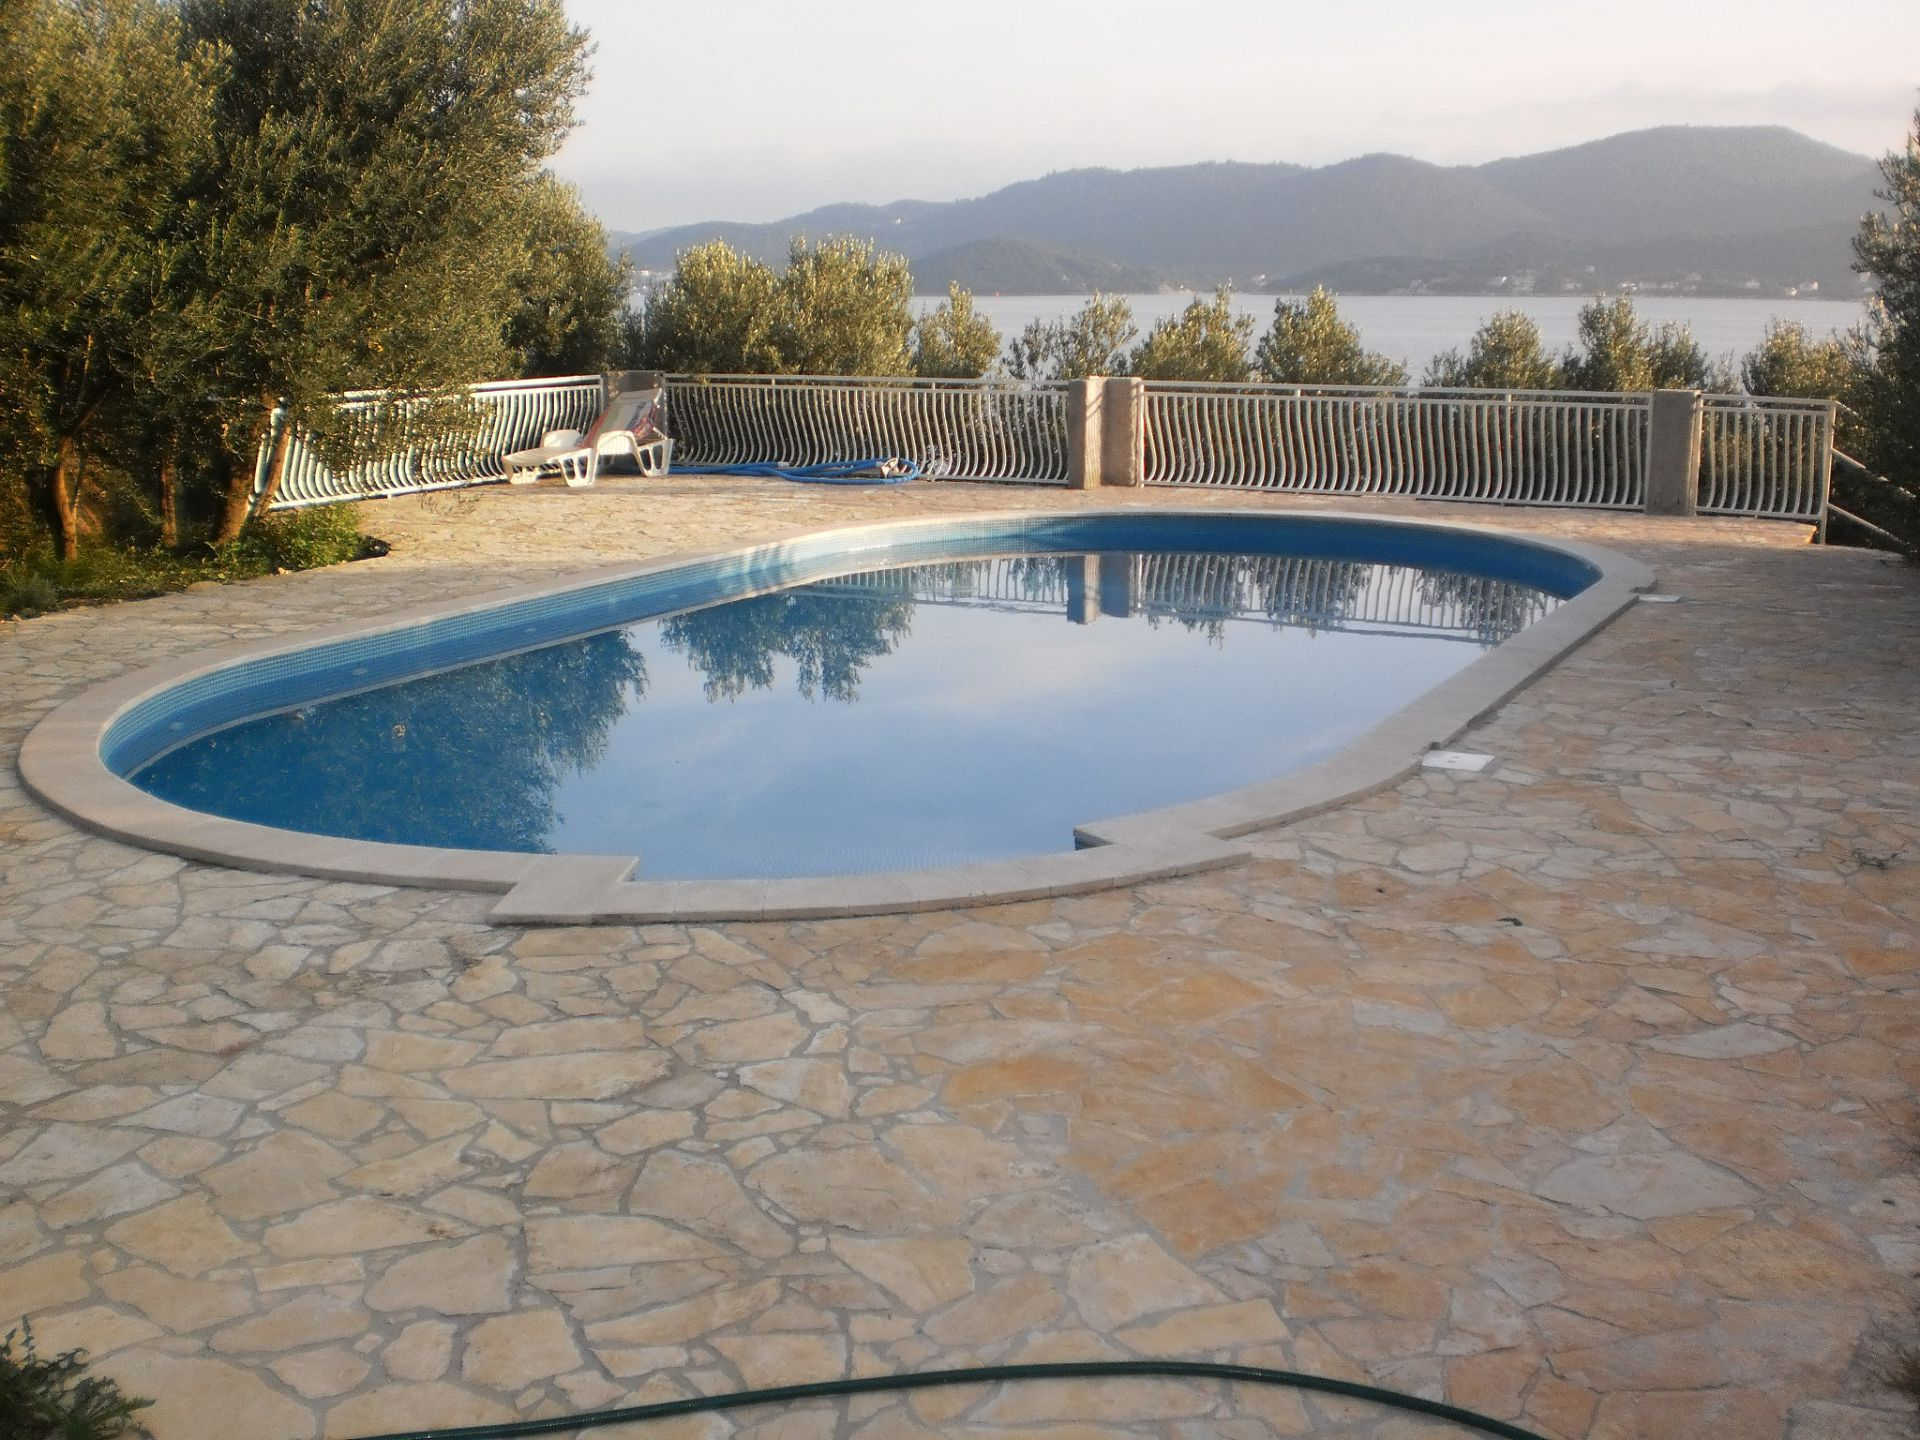 00217VIGA - Viganj - Appartamenti Croazia - la piscina